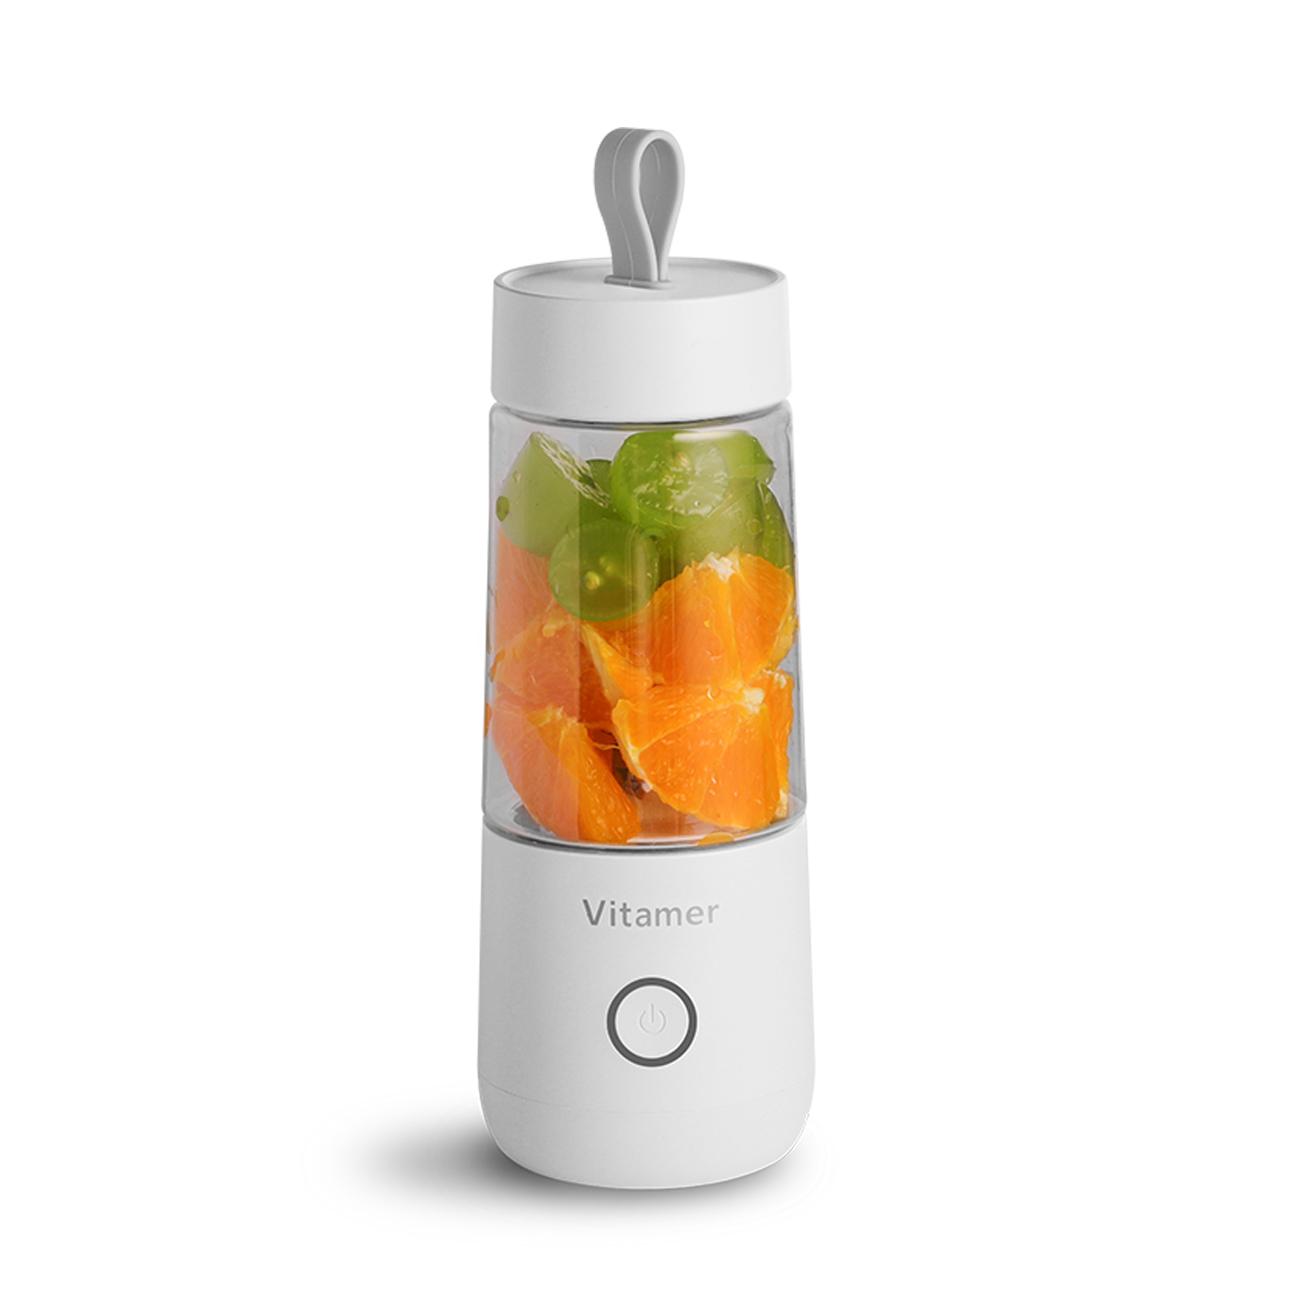 Vitamer Portable Cordless Juicer Blender Mixer USB Rechargeable White ES03-JCUPWH